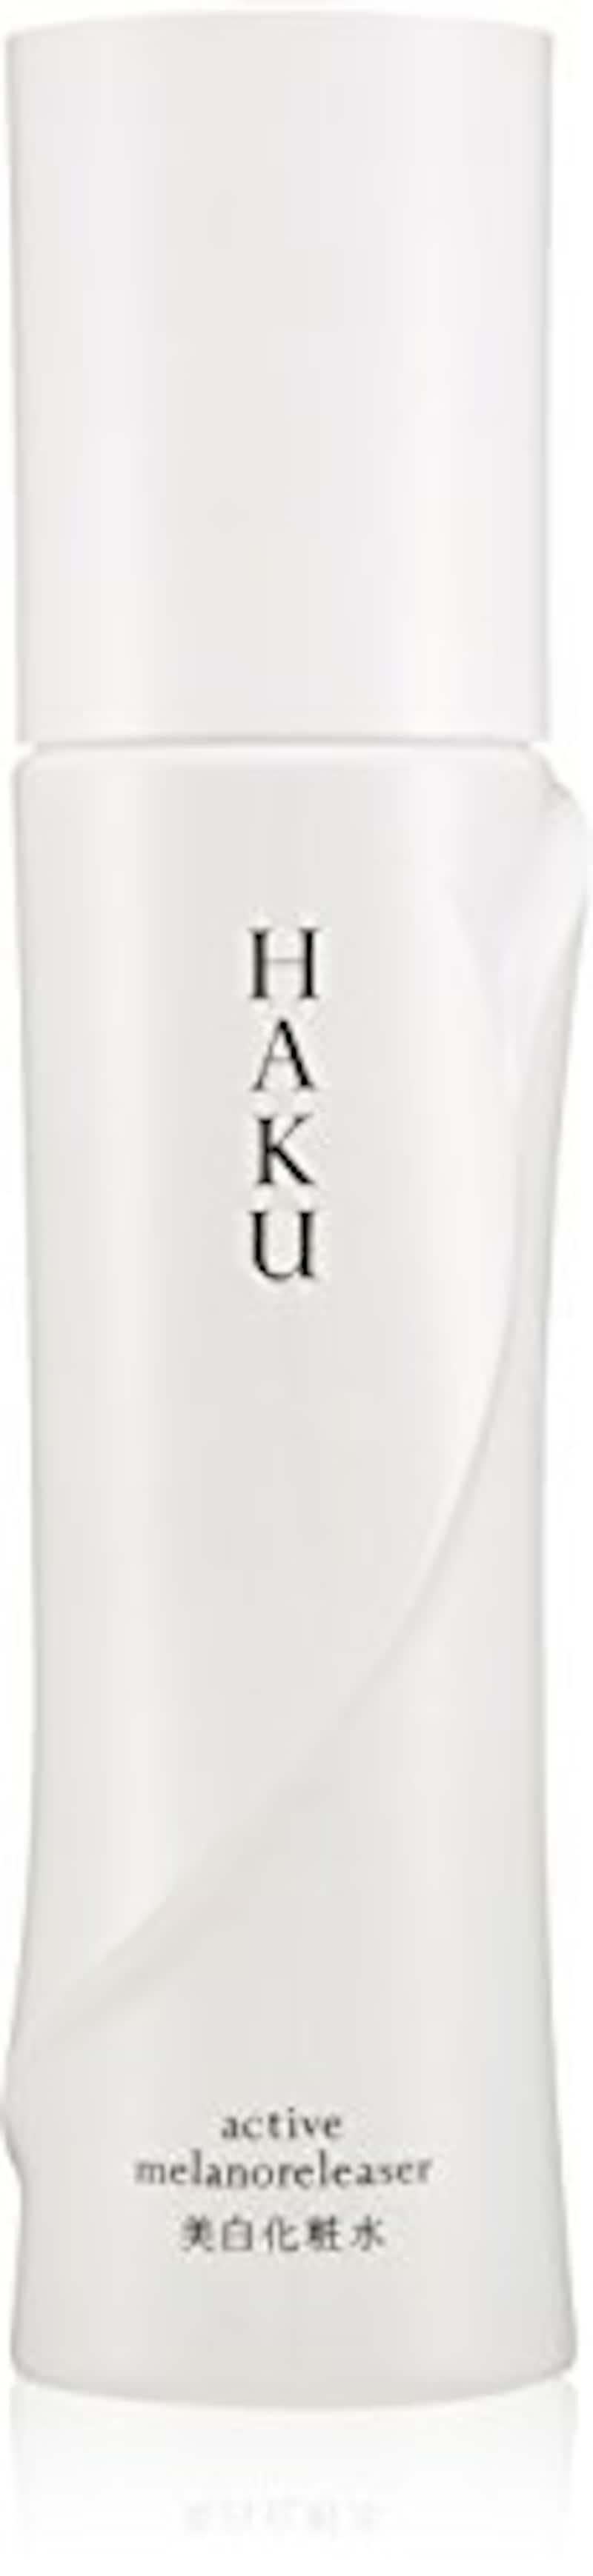 HAKU(ハク),アクティブメラノリリーサー,67401